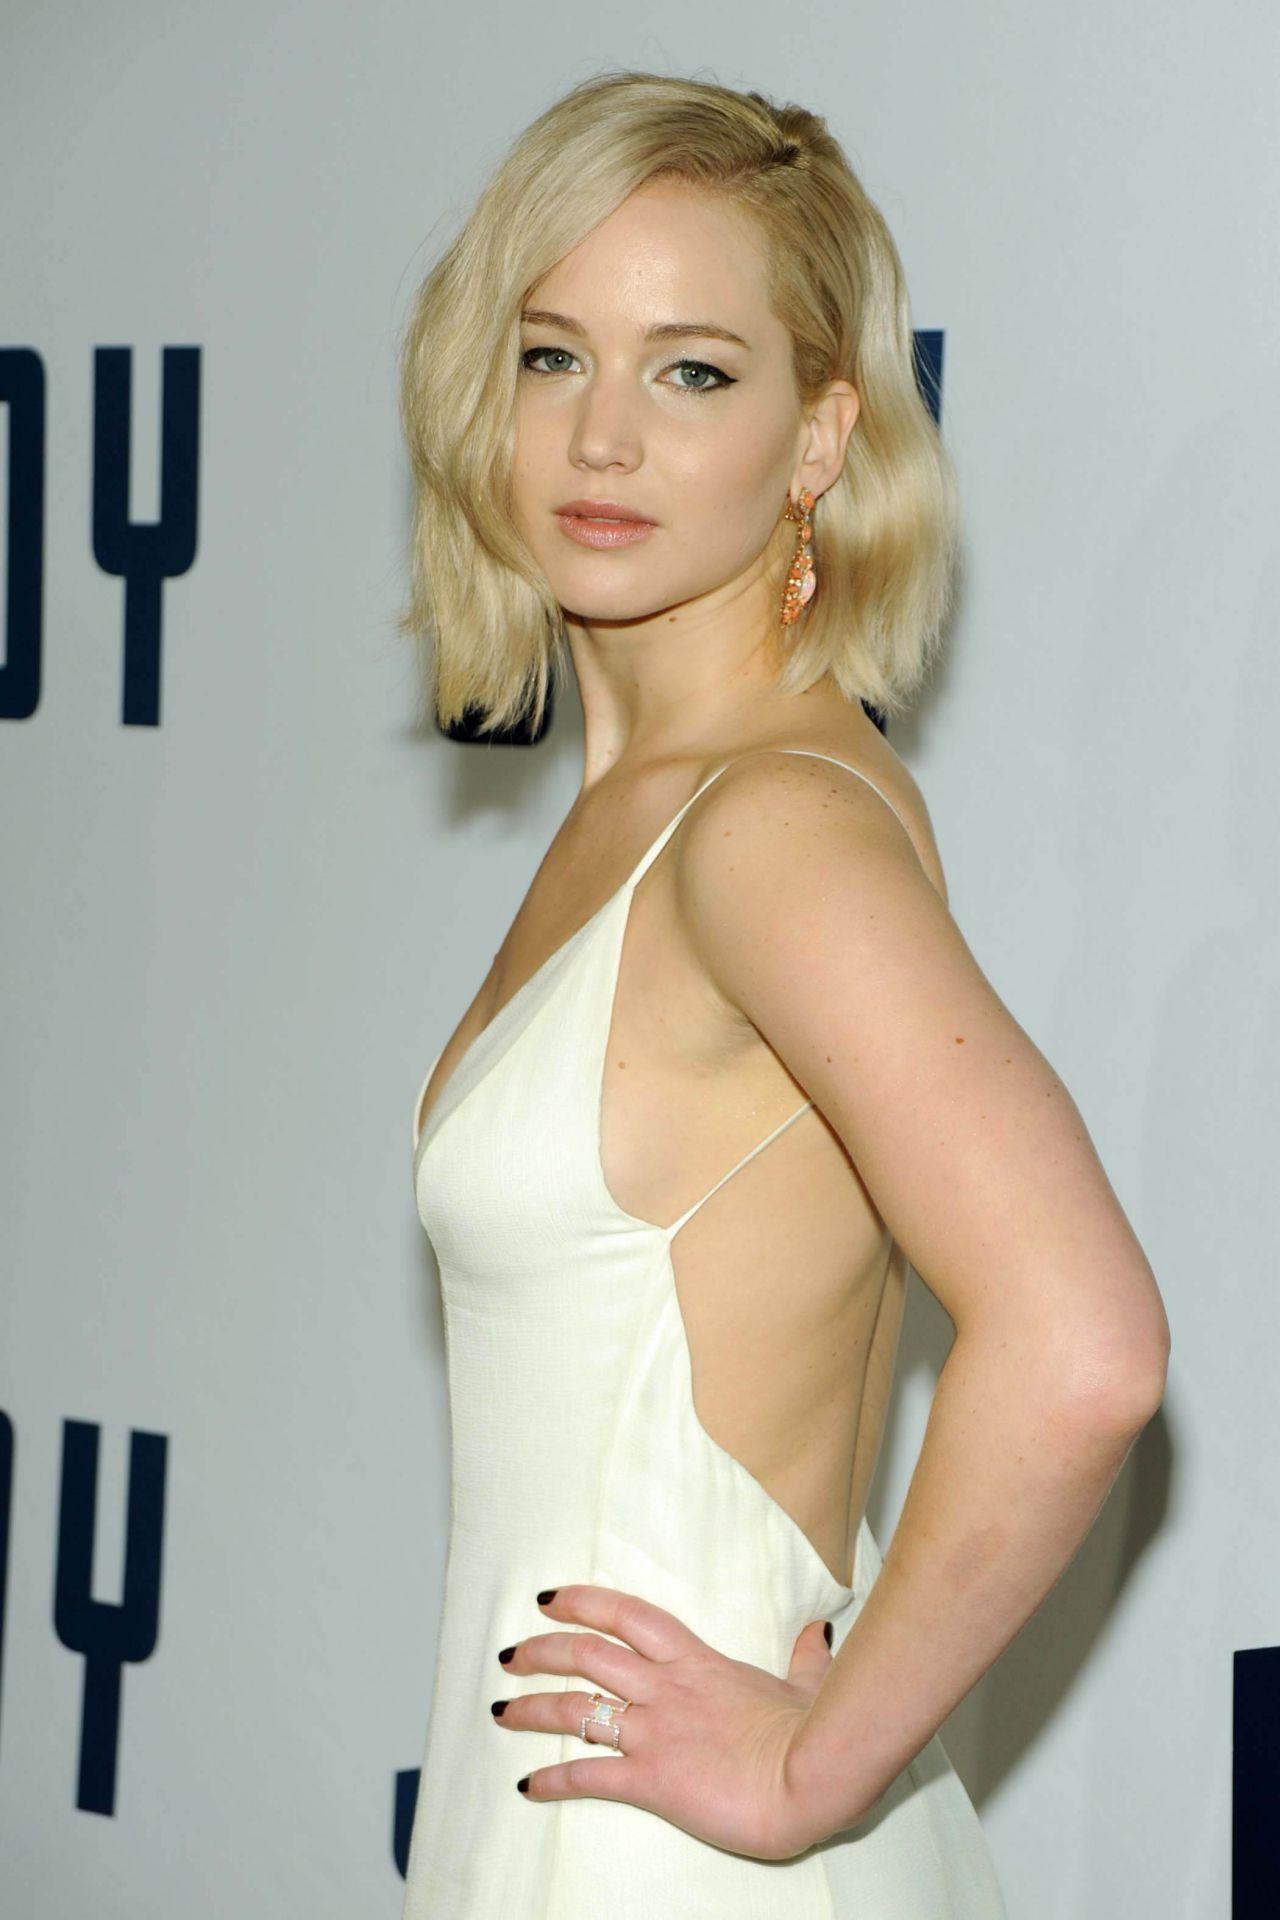 Jennifer lawrence joy premiere in new york city